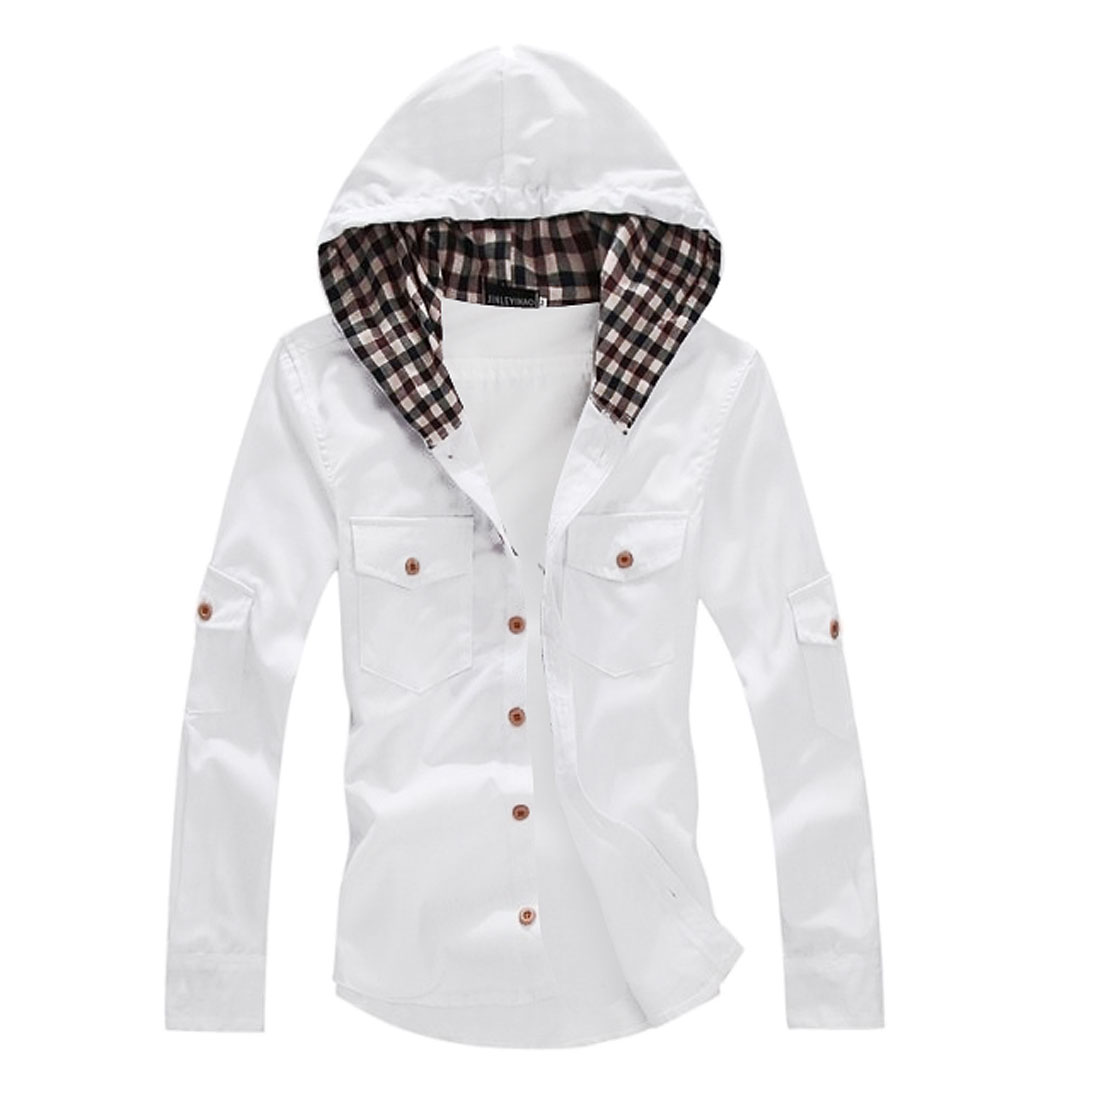 Men Leisure Chest Pocket Decor Button Front White Hoodie M